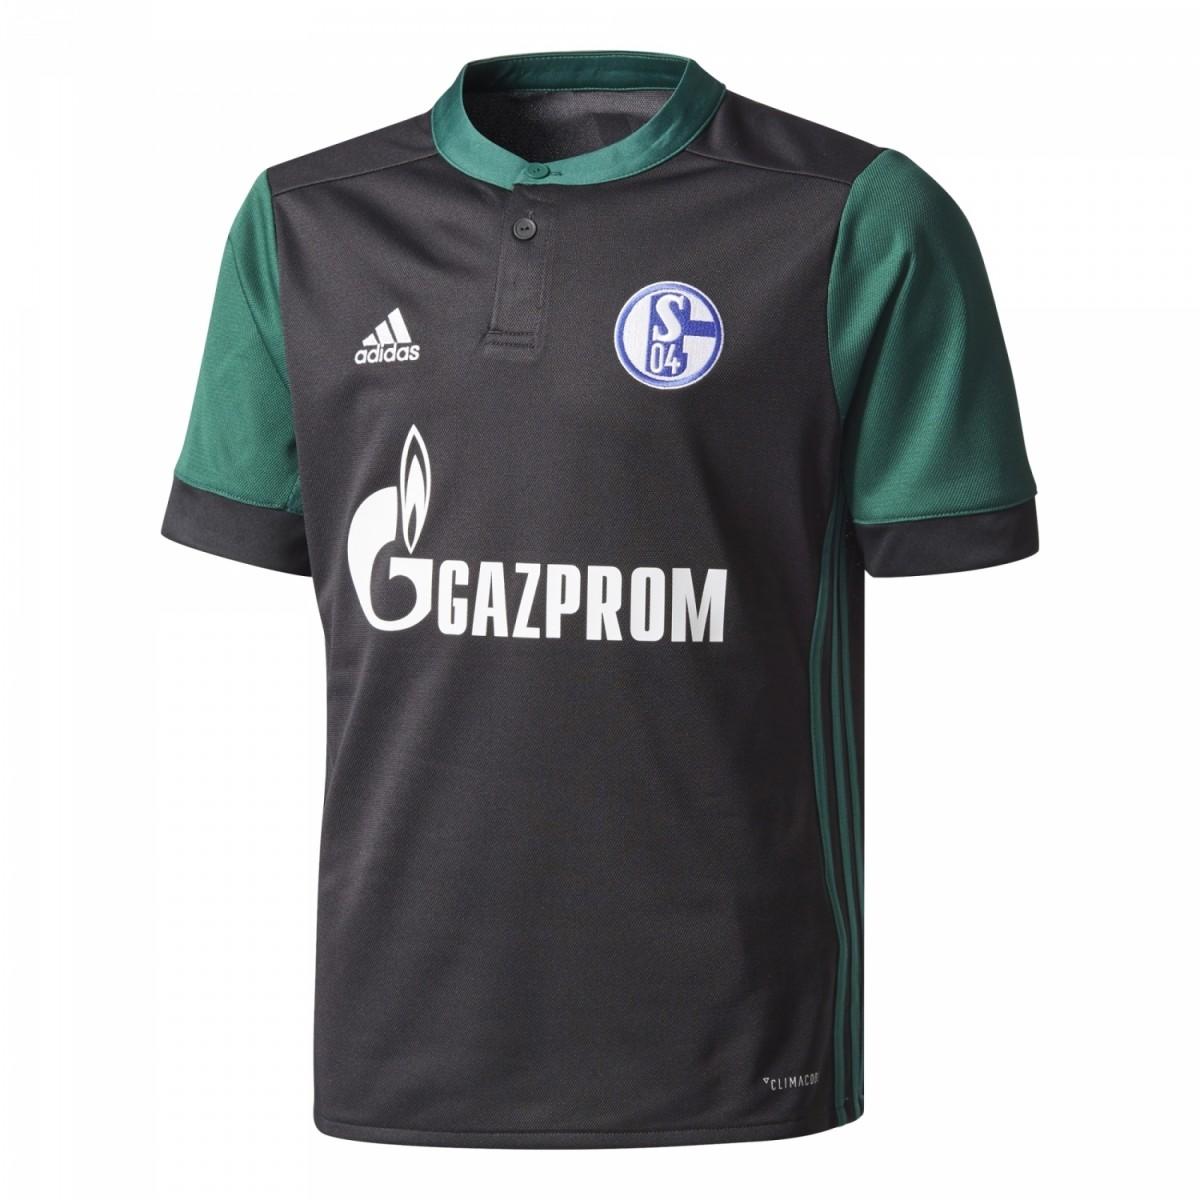 adidas FC Schalke 04 Kinder Ausweichtrikot 3rd 2017/2018 schwarz grün